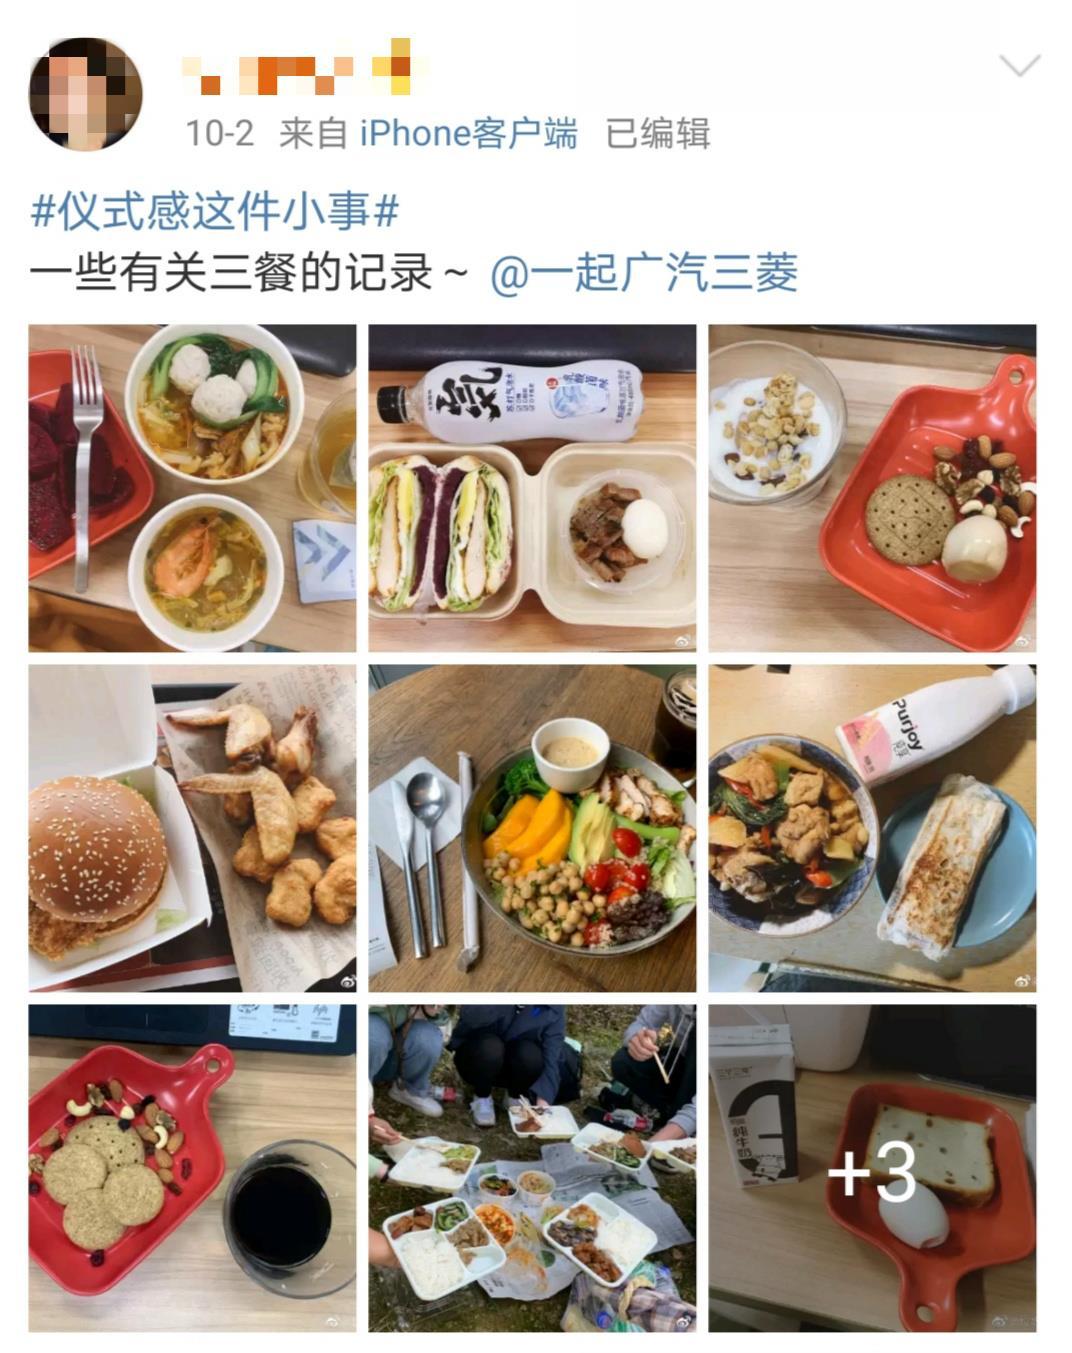 //img5.autotimes.com.cn/news/2020/10/1018_210518184466.jpg